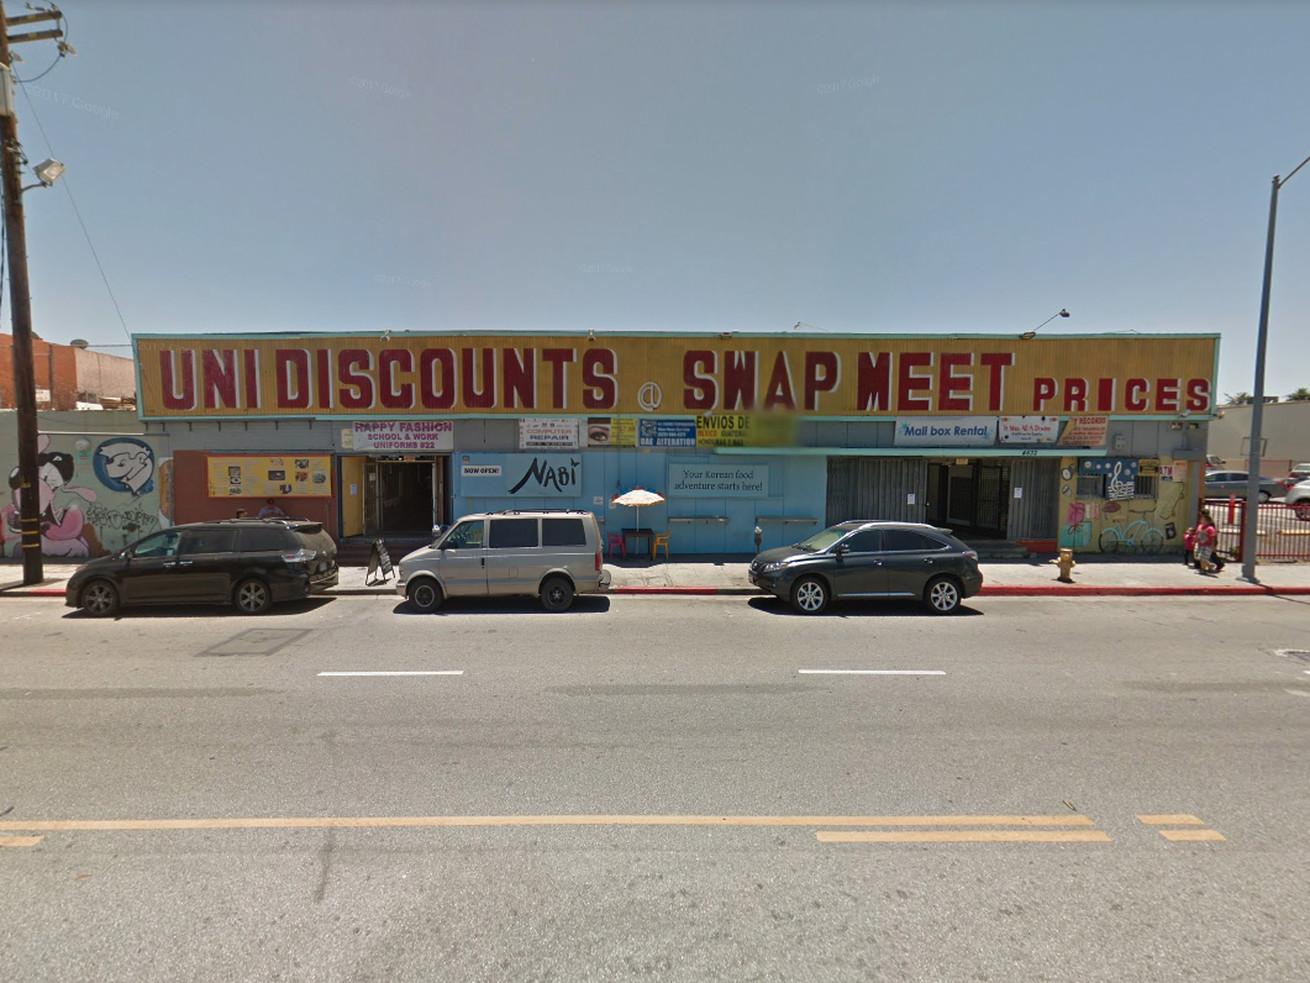 The swap meet at 4632 West Santa Monica Boulevard, just east of the Vermont/Santa Monica rail station.